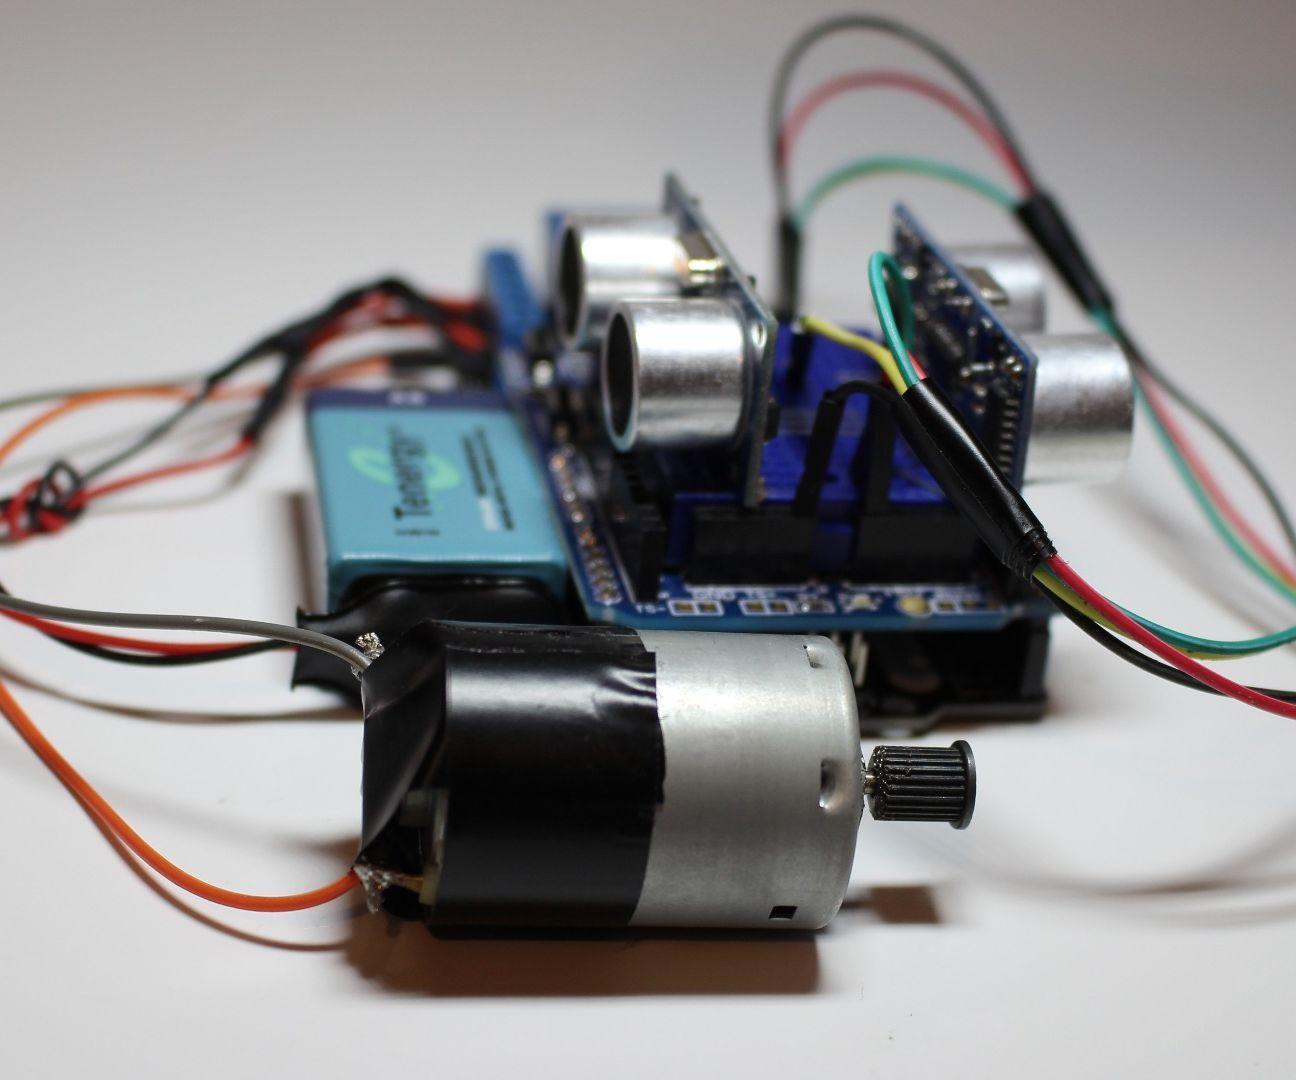 Control a Motor using Ultrasonic Distance Sensors (HC-SR04)